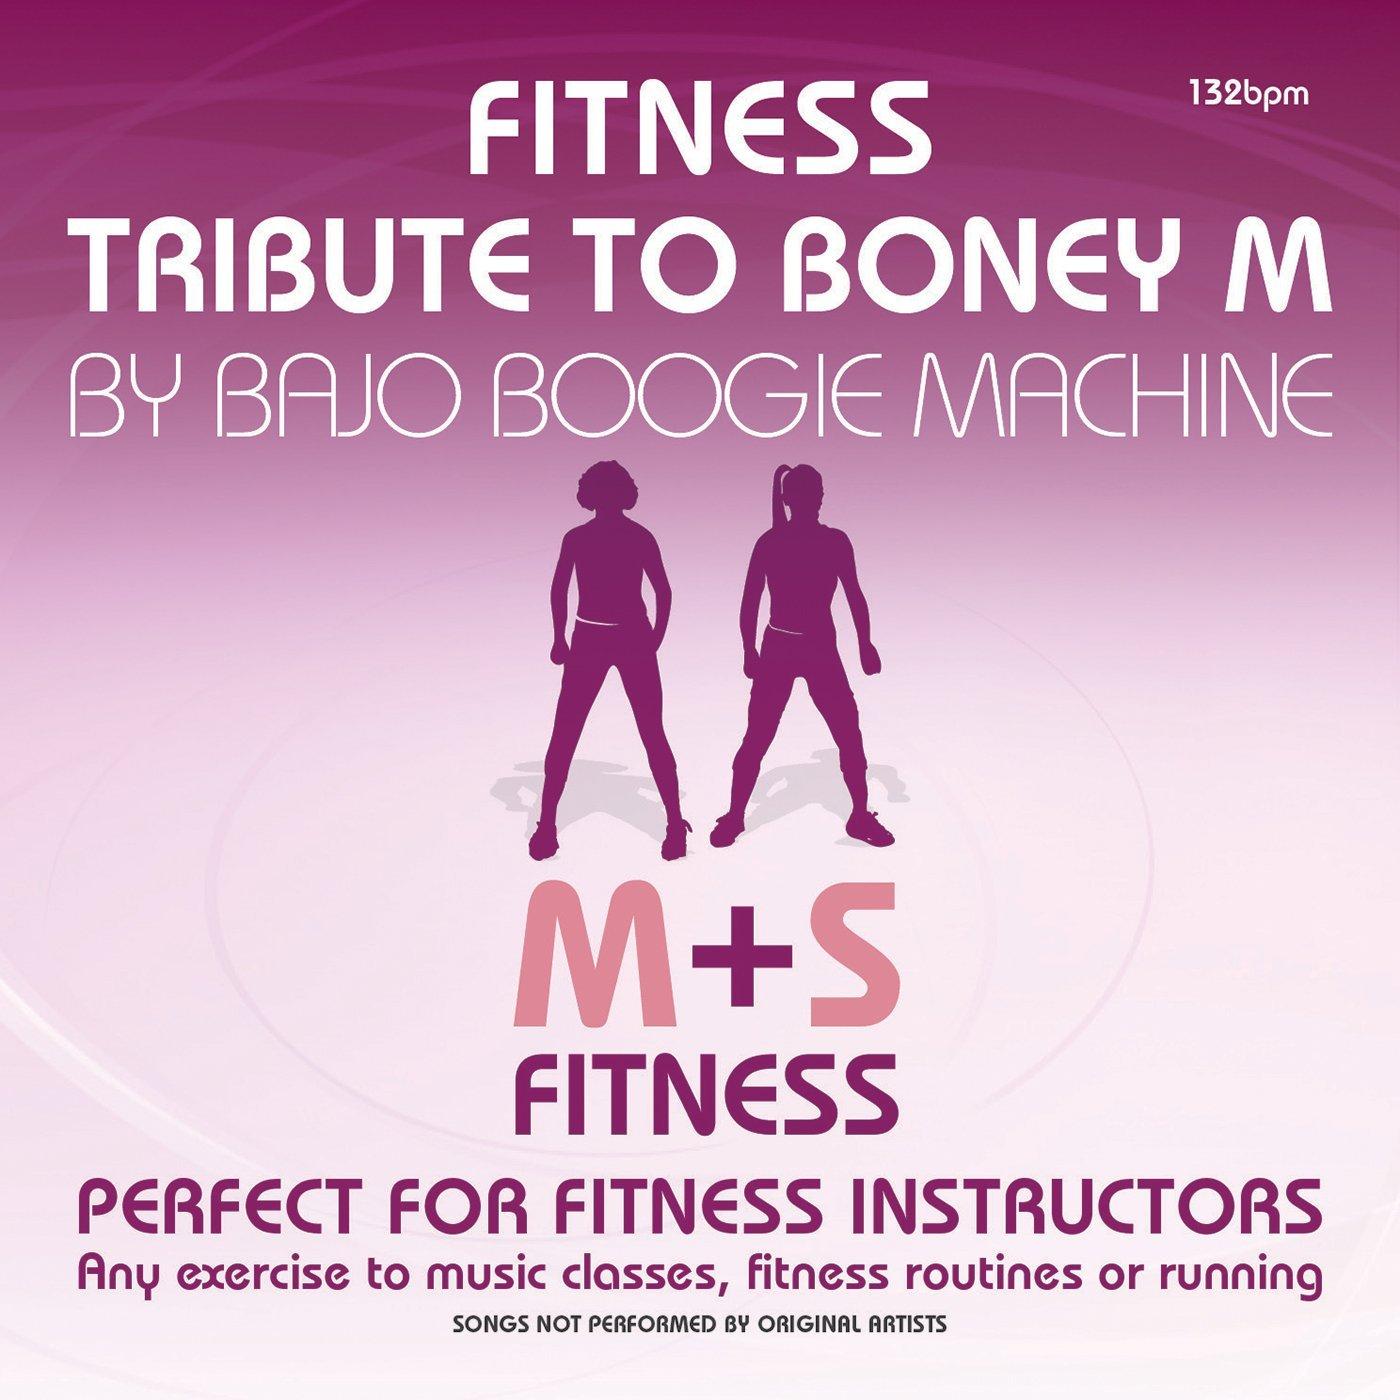 06/09/2017 Fitness Tribute to Boney M. (CD/DVD) BMF1